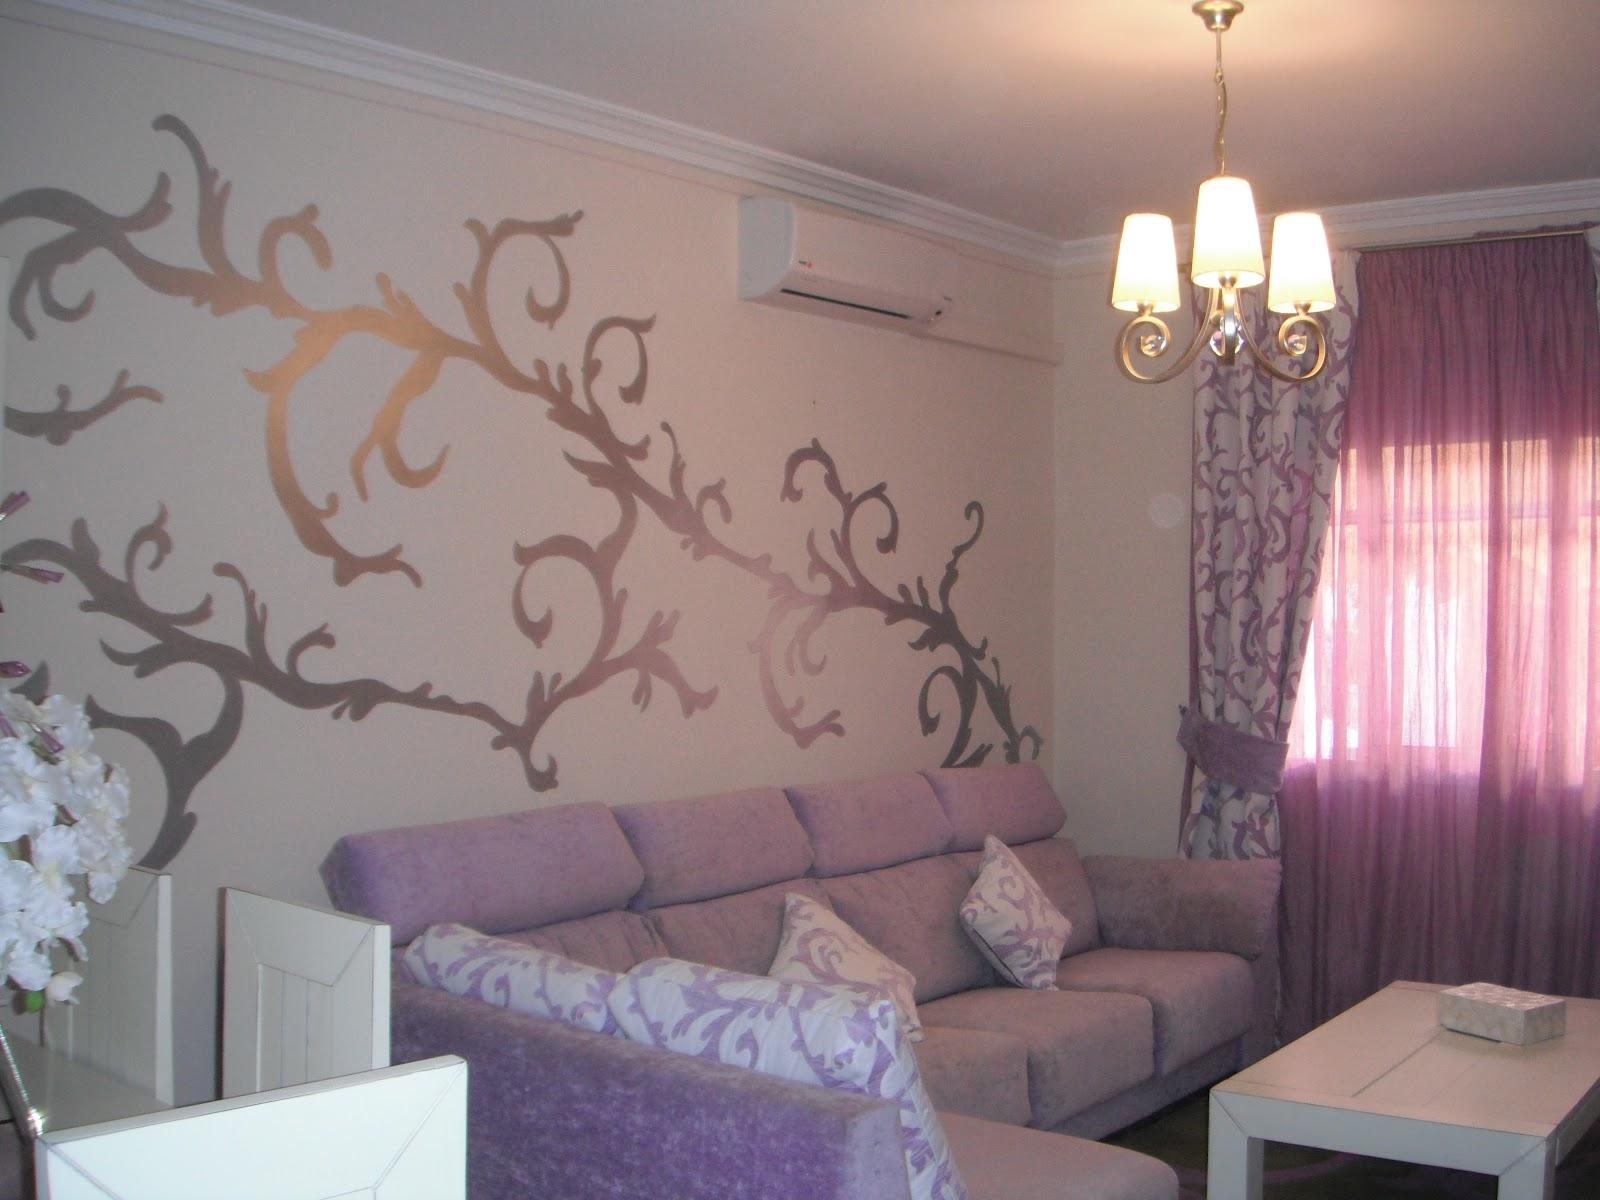 Trescoloresson sal n de m nica - Pintar paredes salon ...